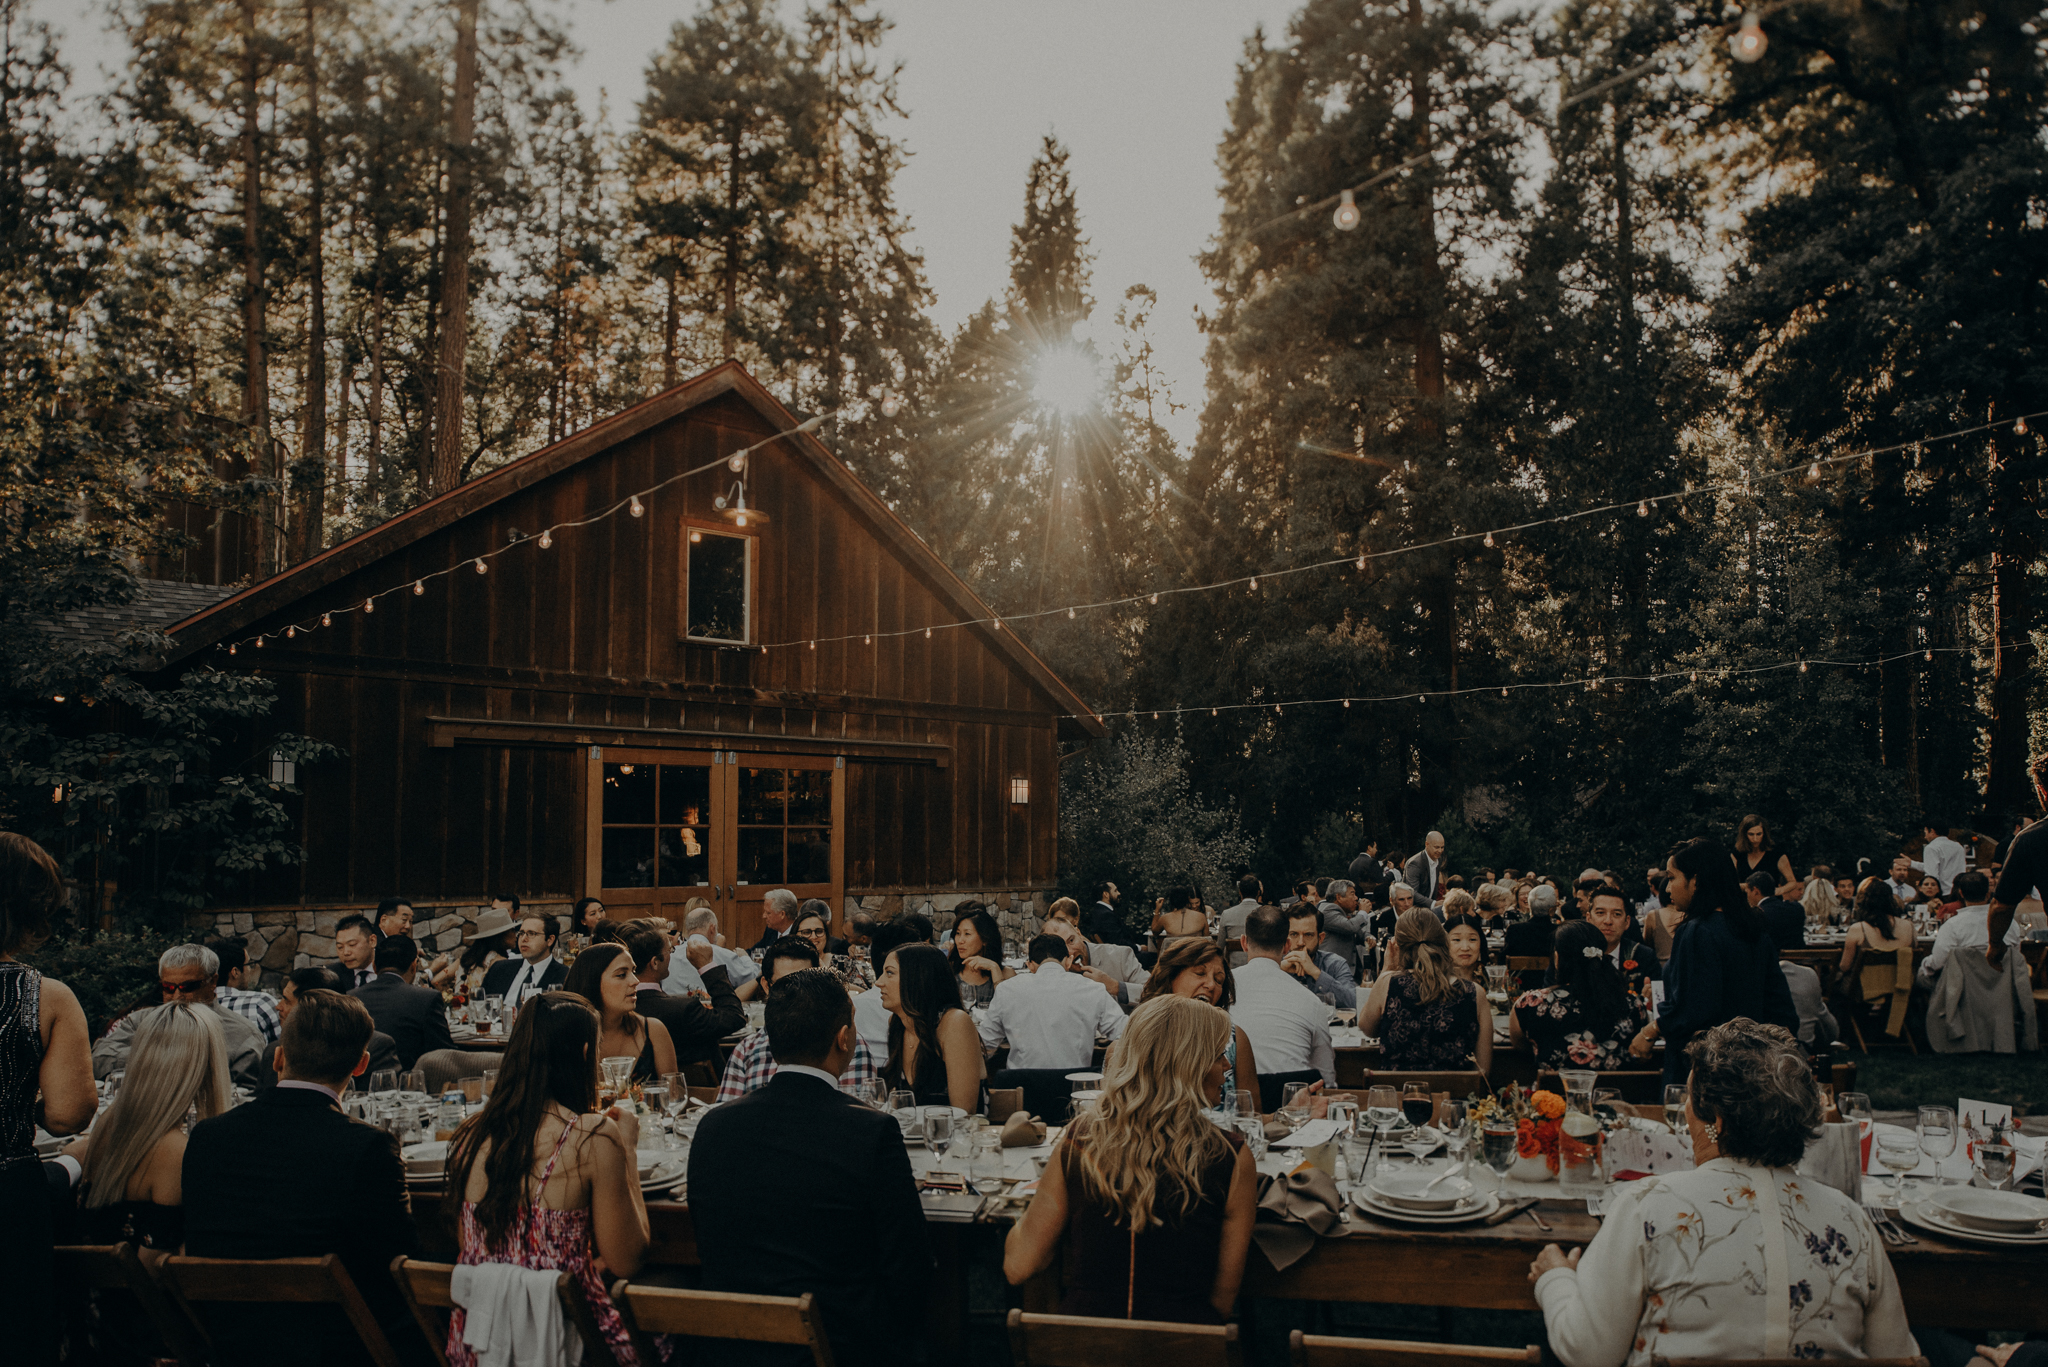 Yosemite Elopement Photographer - Evergreen Lodge Wedding Photographer - IsaiahAndTaylor.com-126.jpg